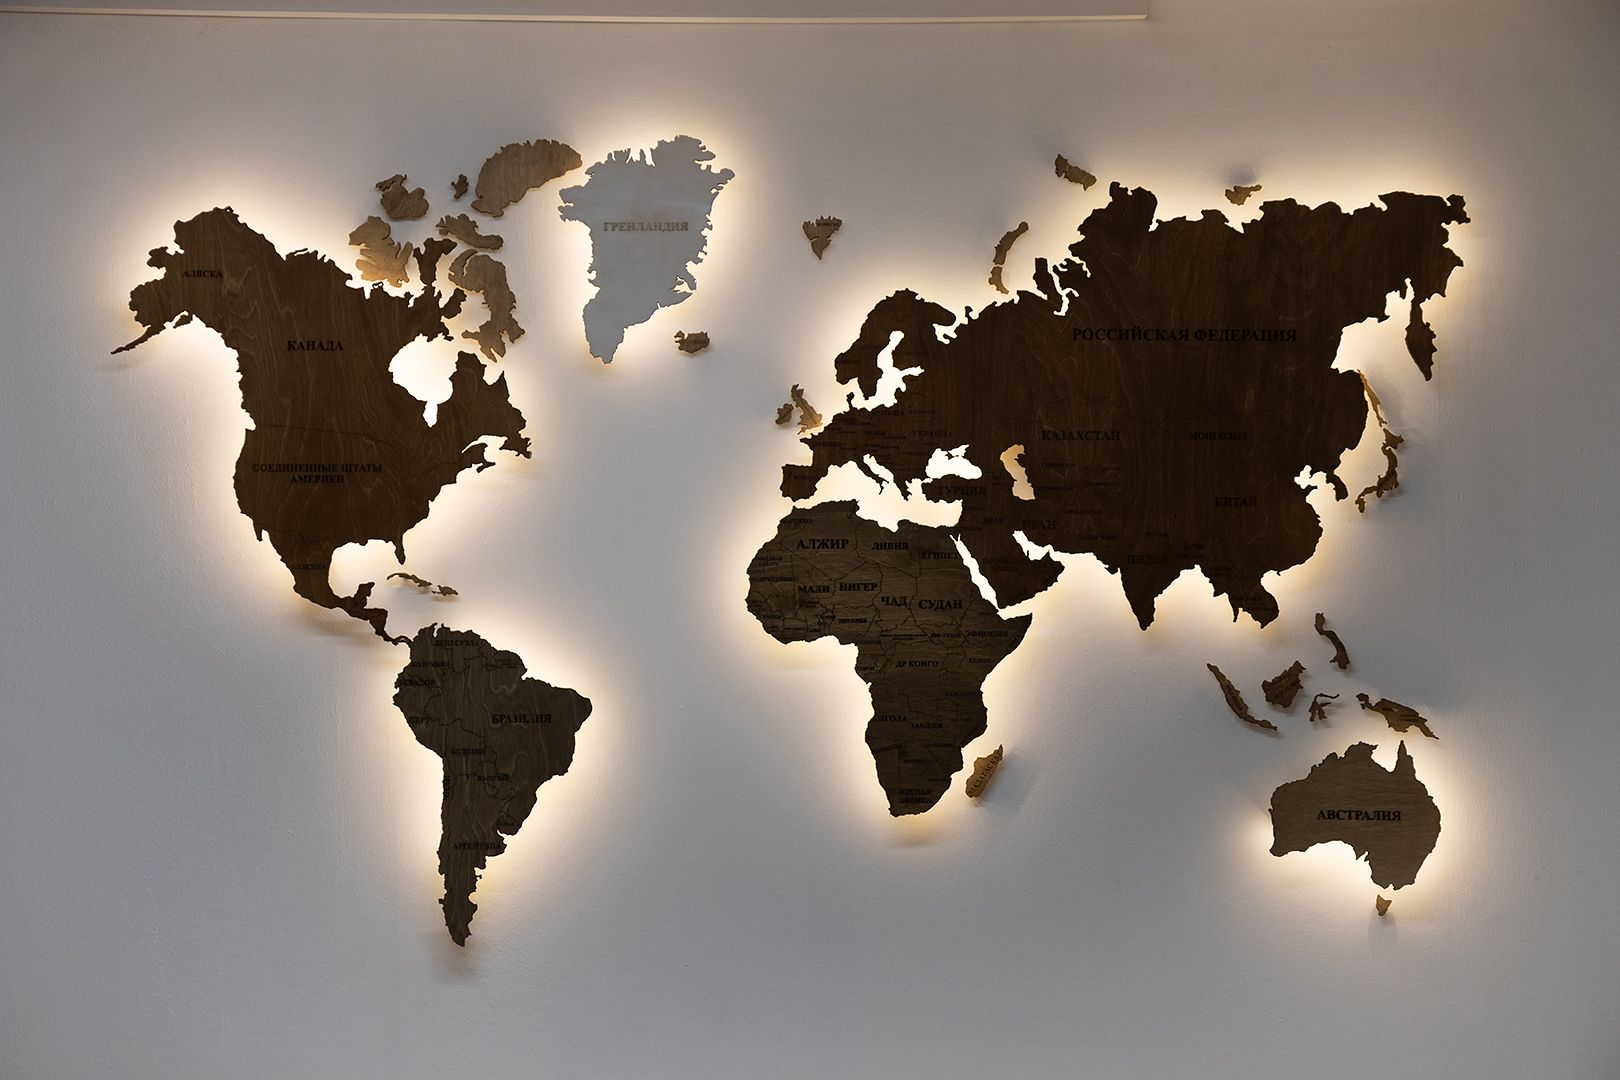 карта мира на стену, карта мира купить на стену, купить ...